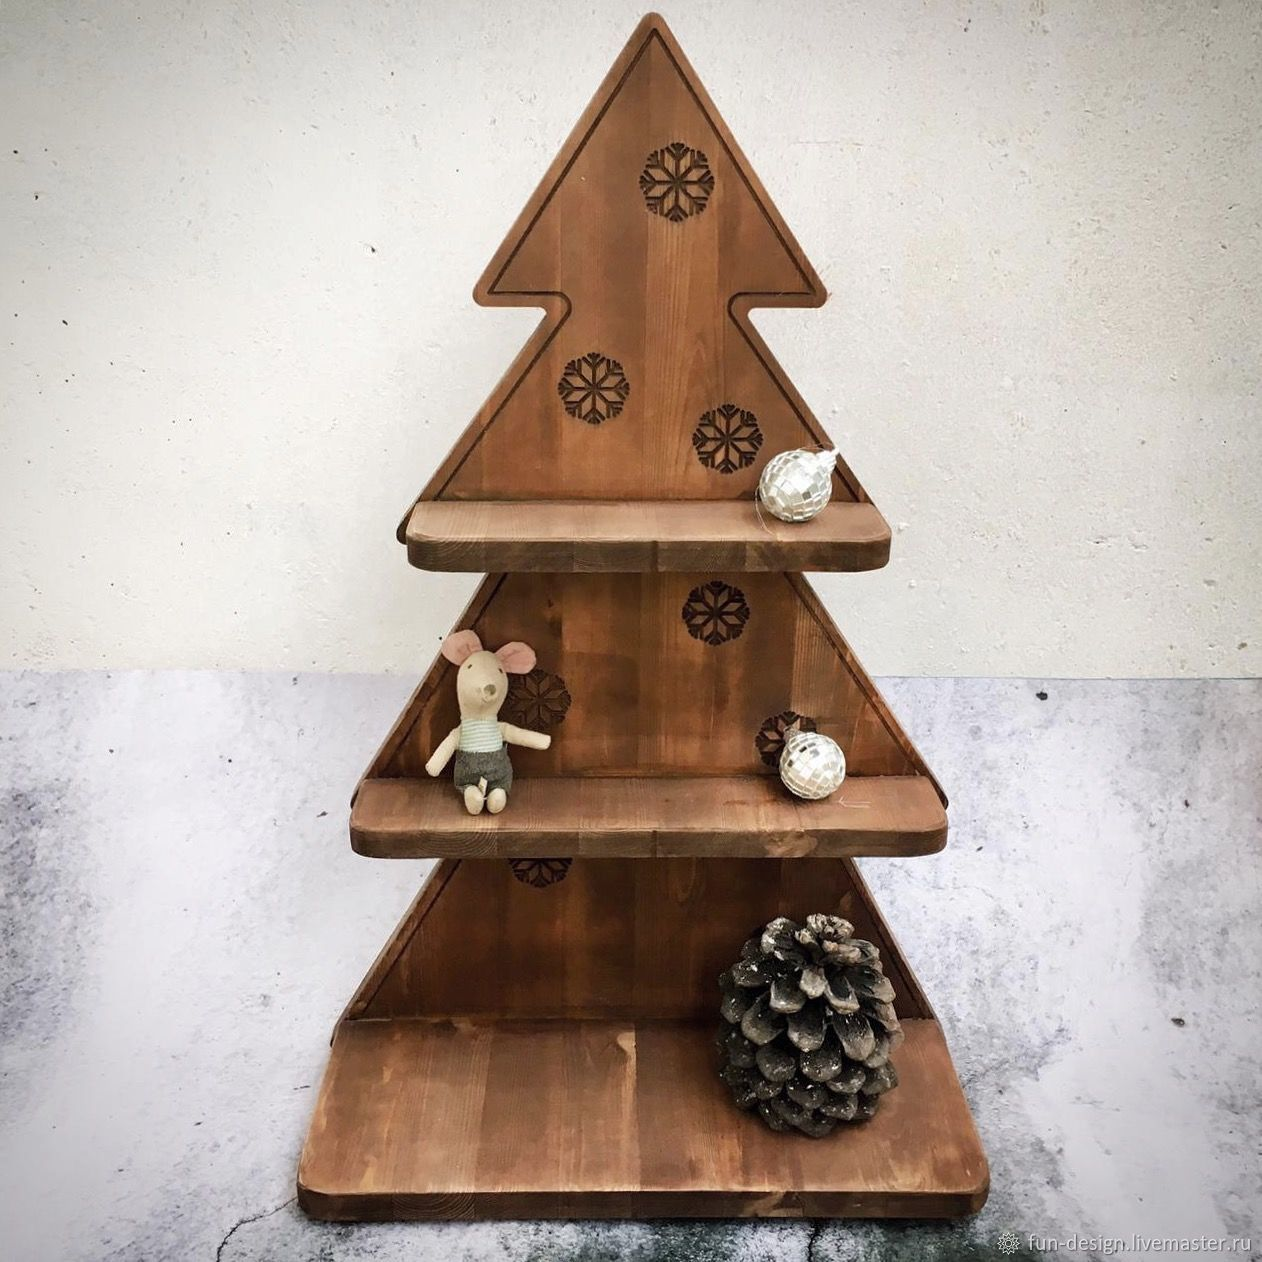 Wooden Christmas Tree Shelf